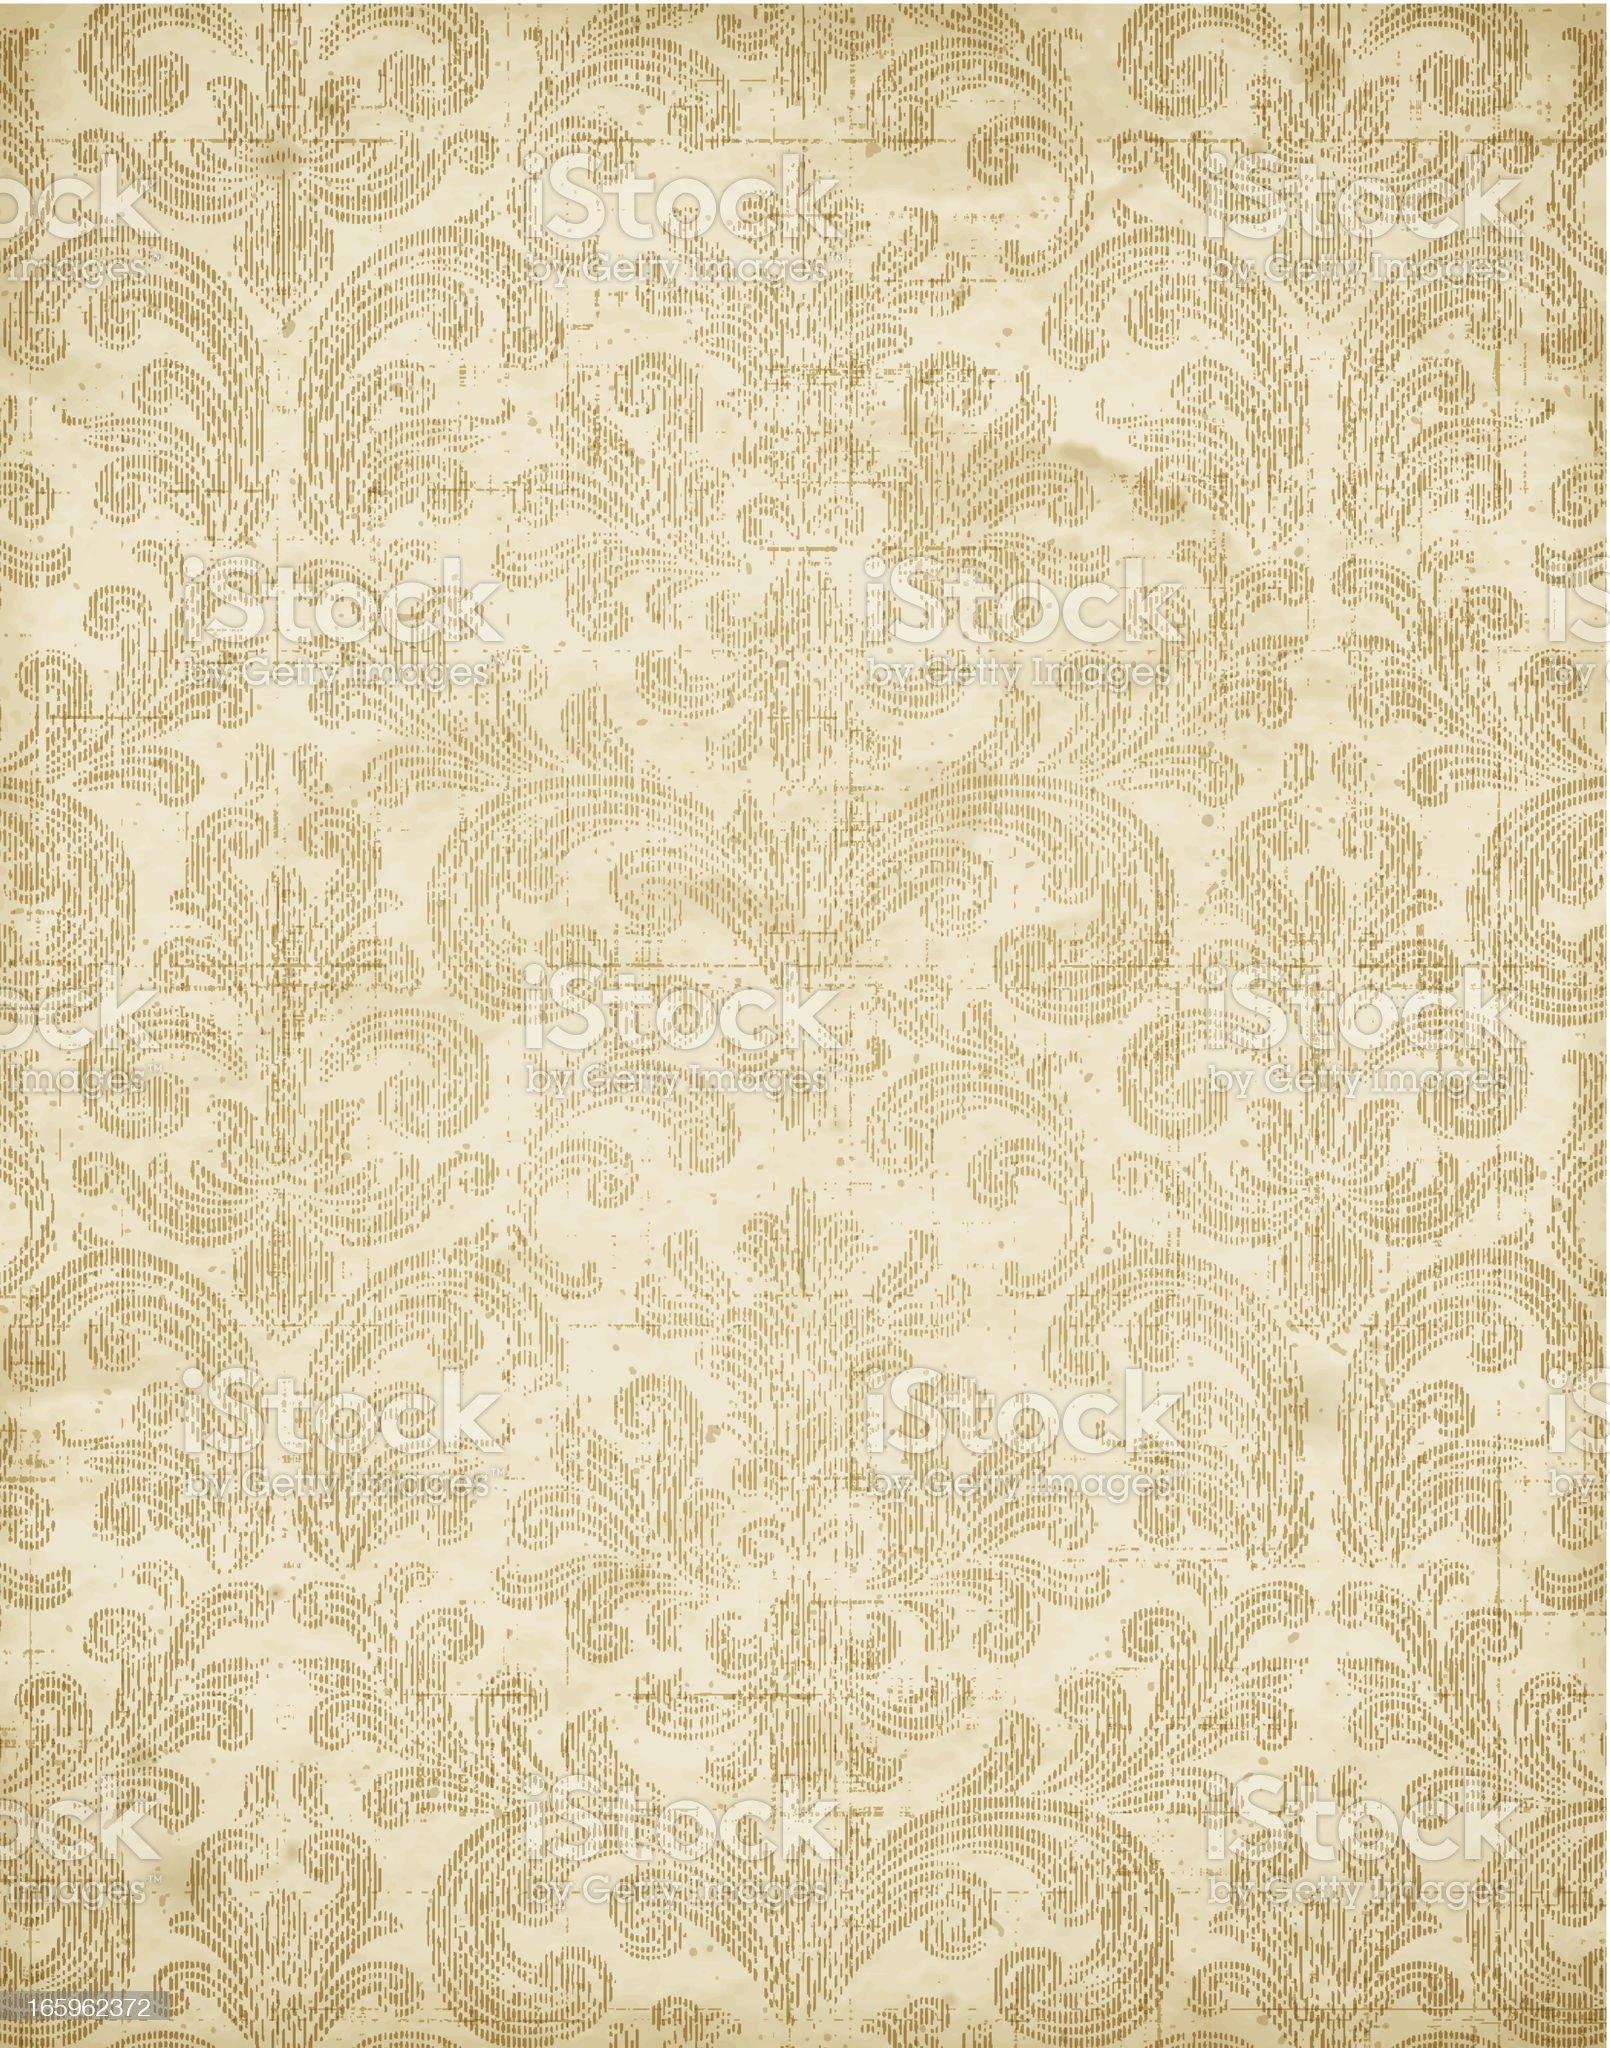 Vintage Floral Wallpaper Texture Vector royalty-free stock vector art